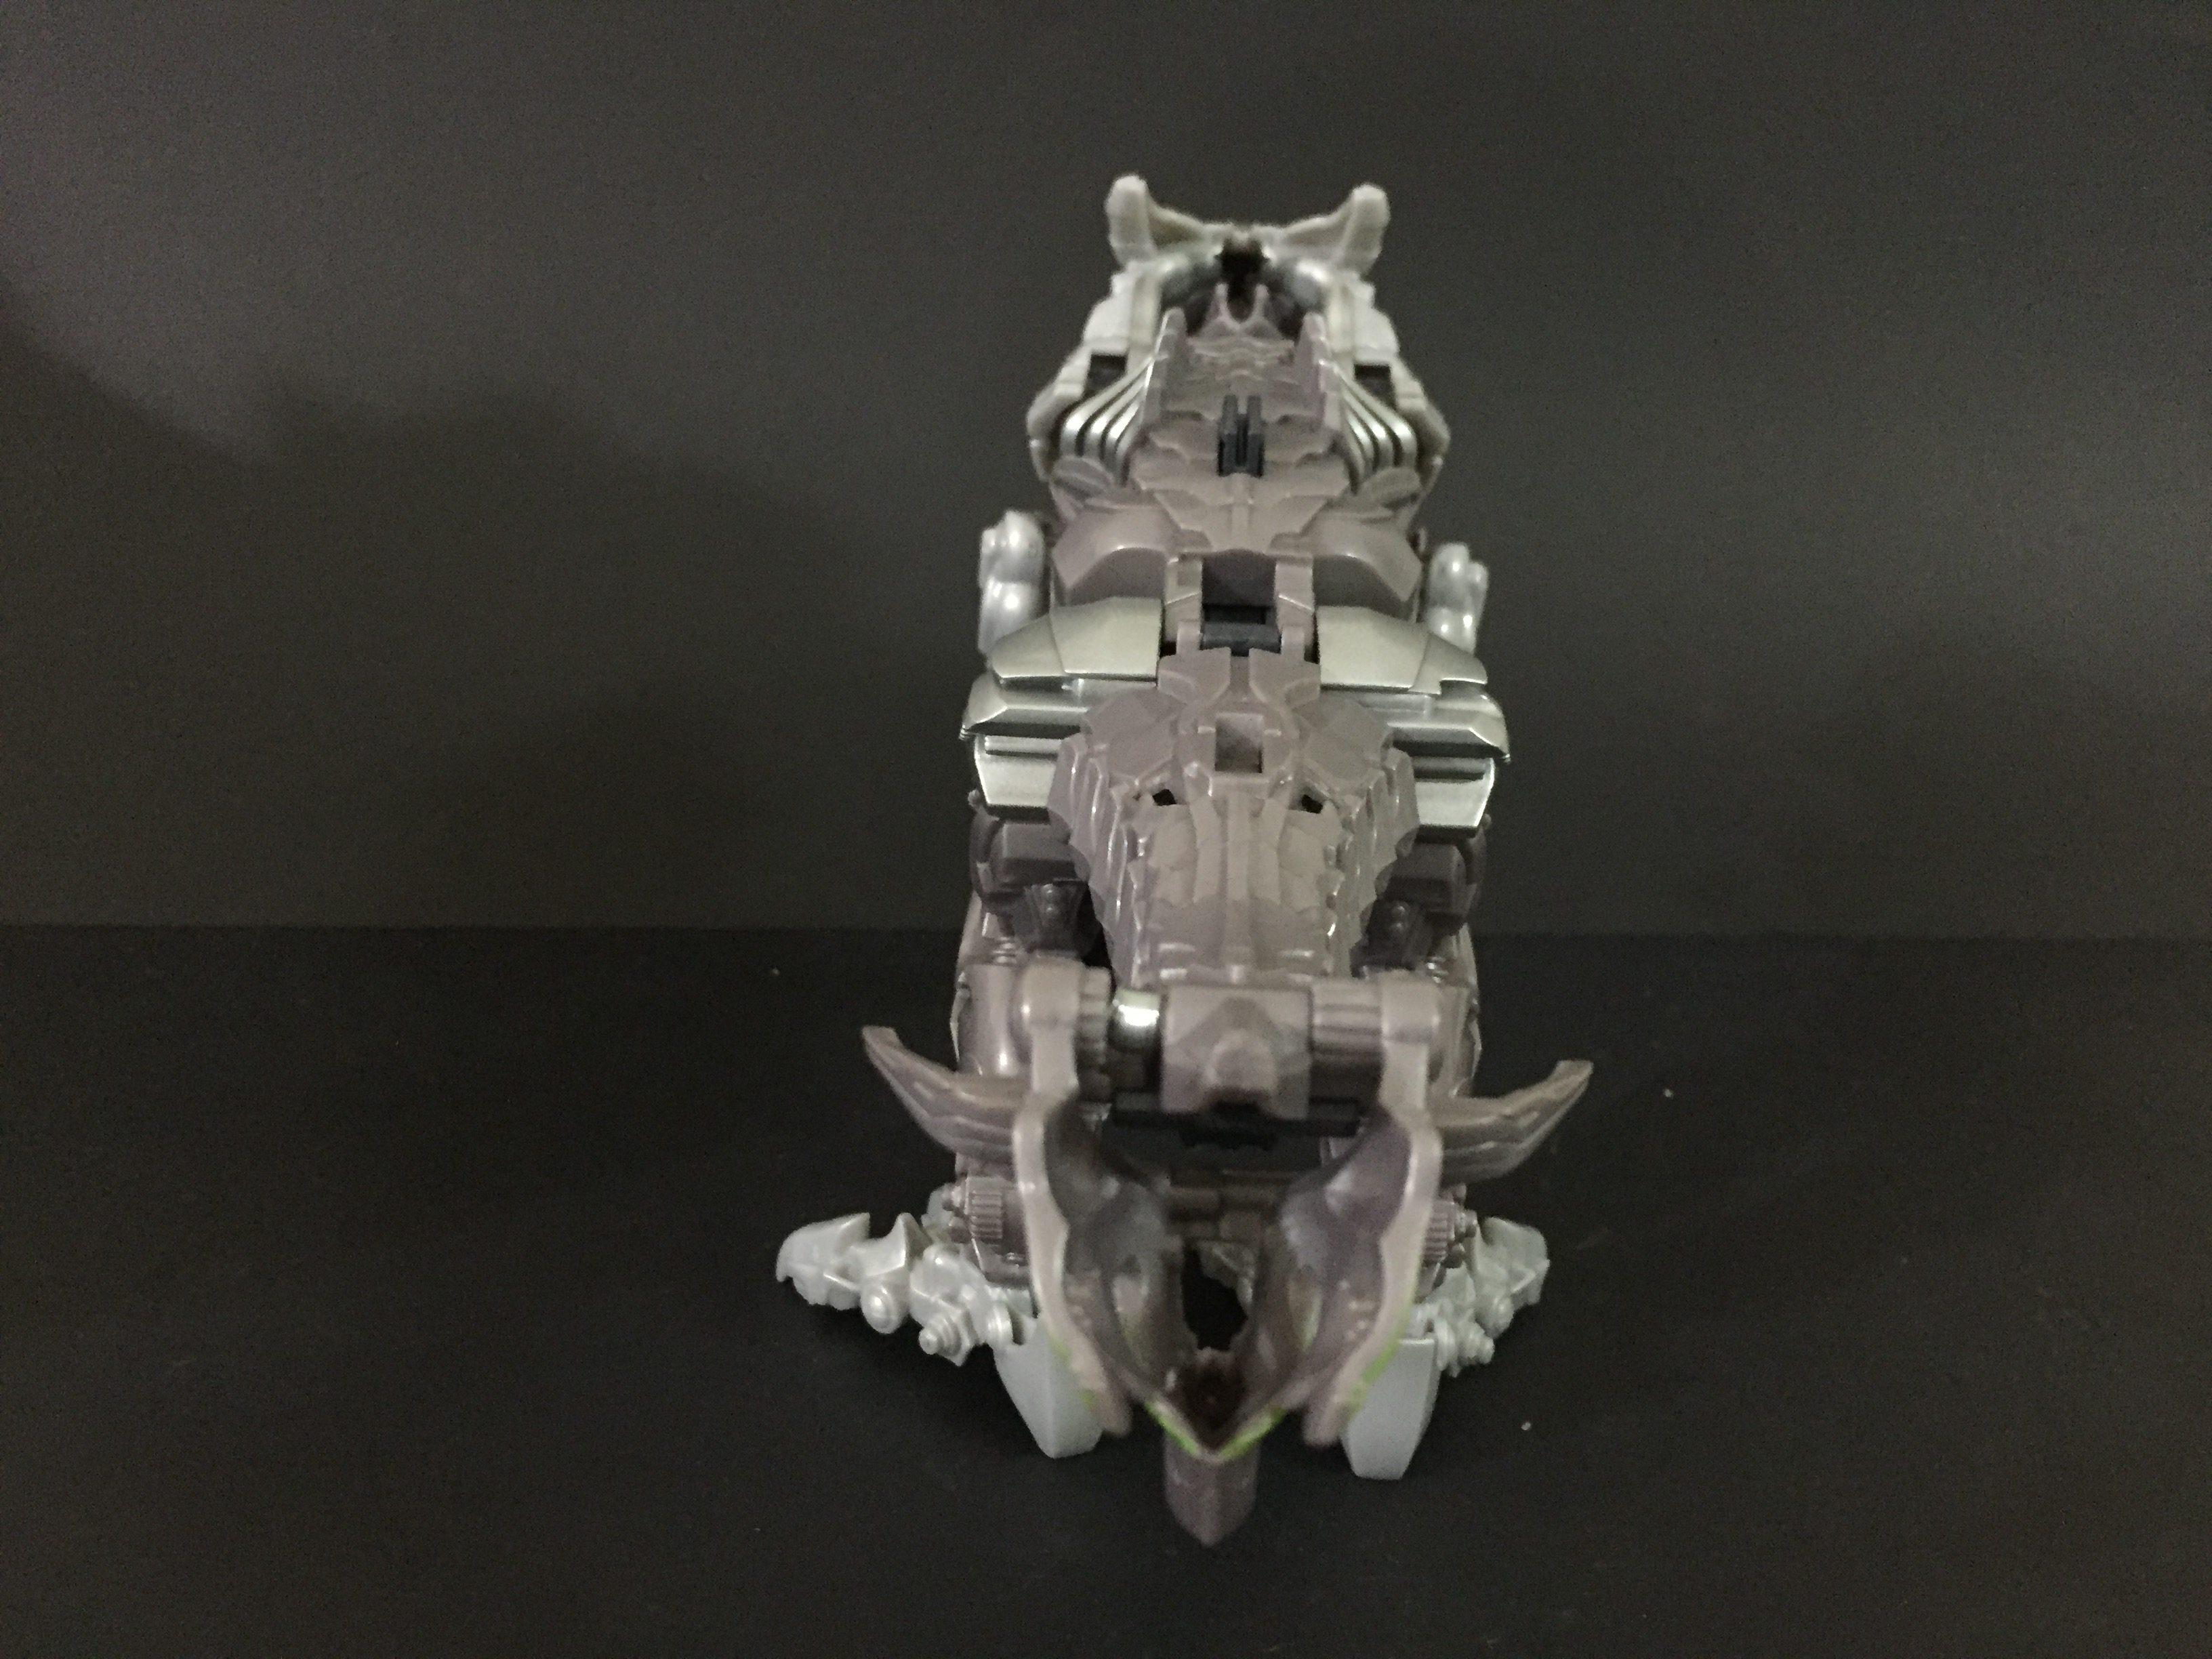 Knight Armor Grimlock. (3-Step Turbo Changer)